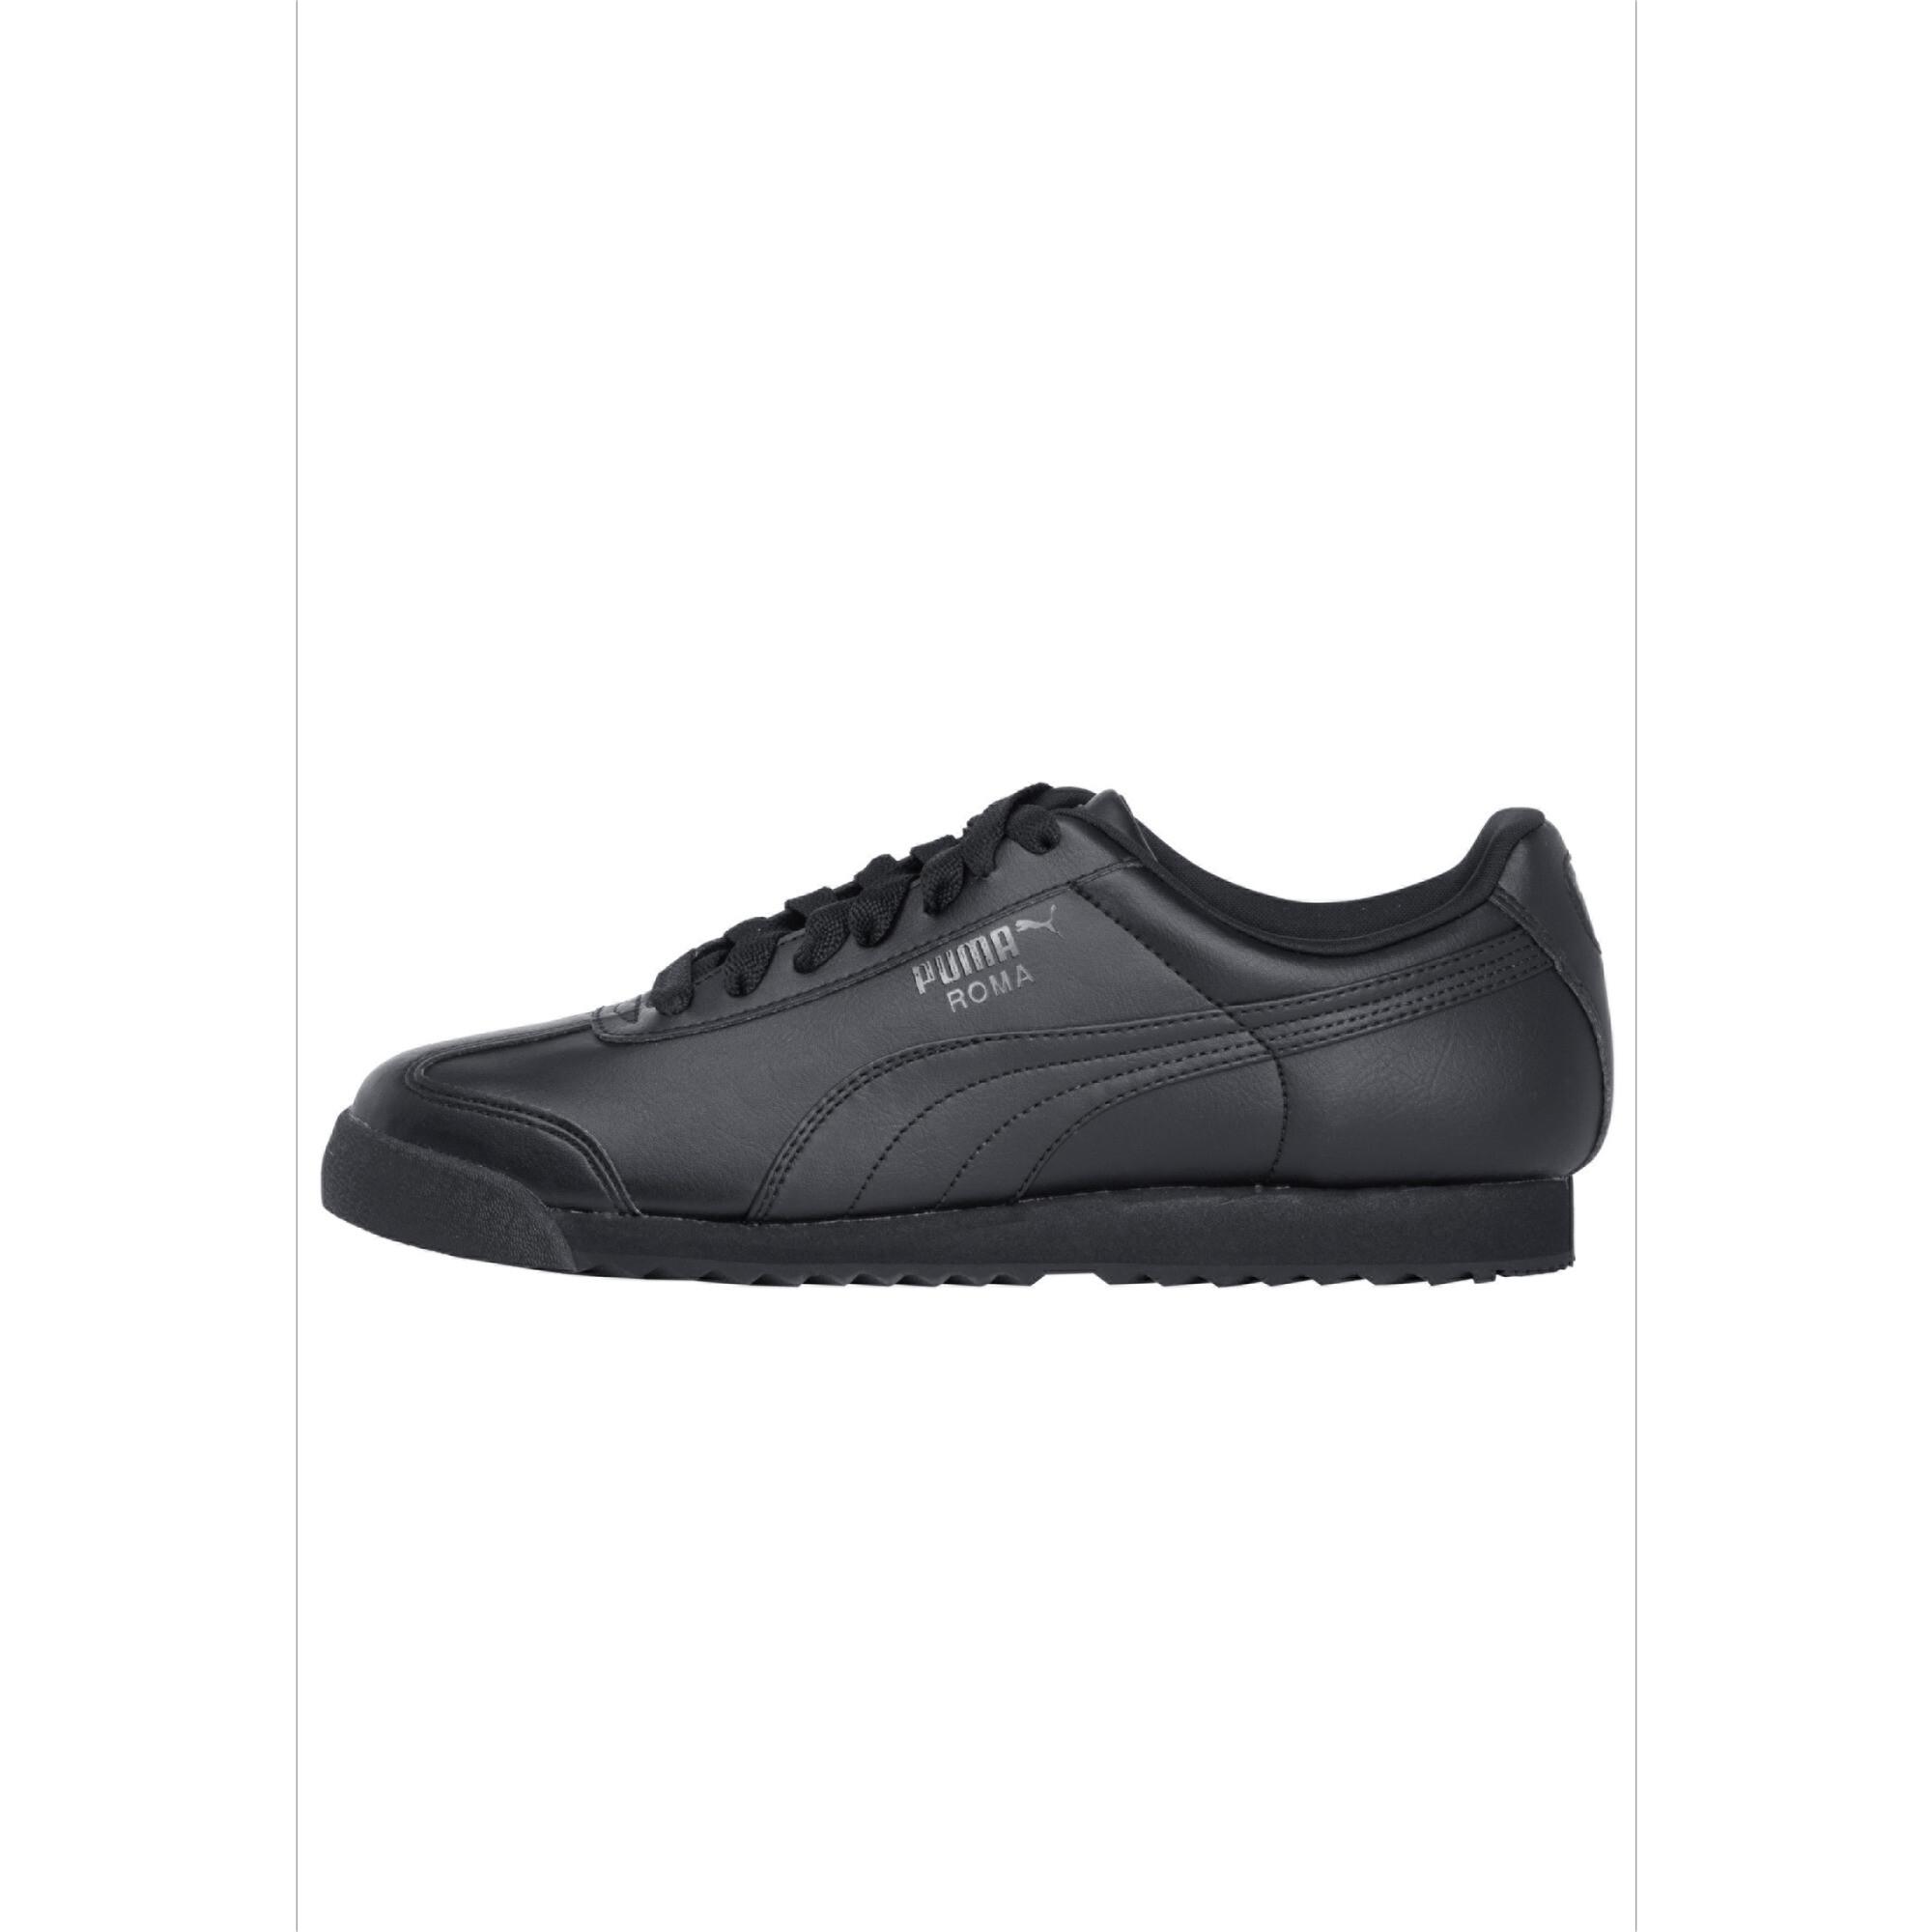 miniature 6 - Puma Men's Roma Basic Sneakers